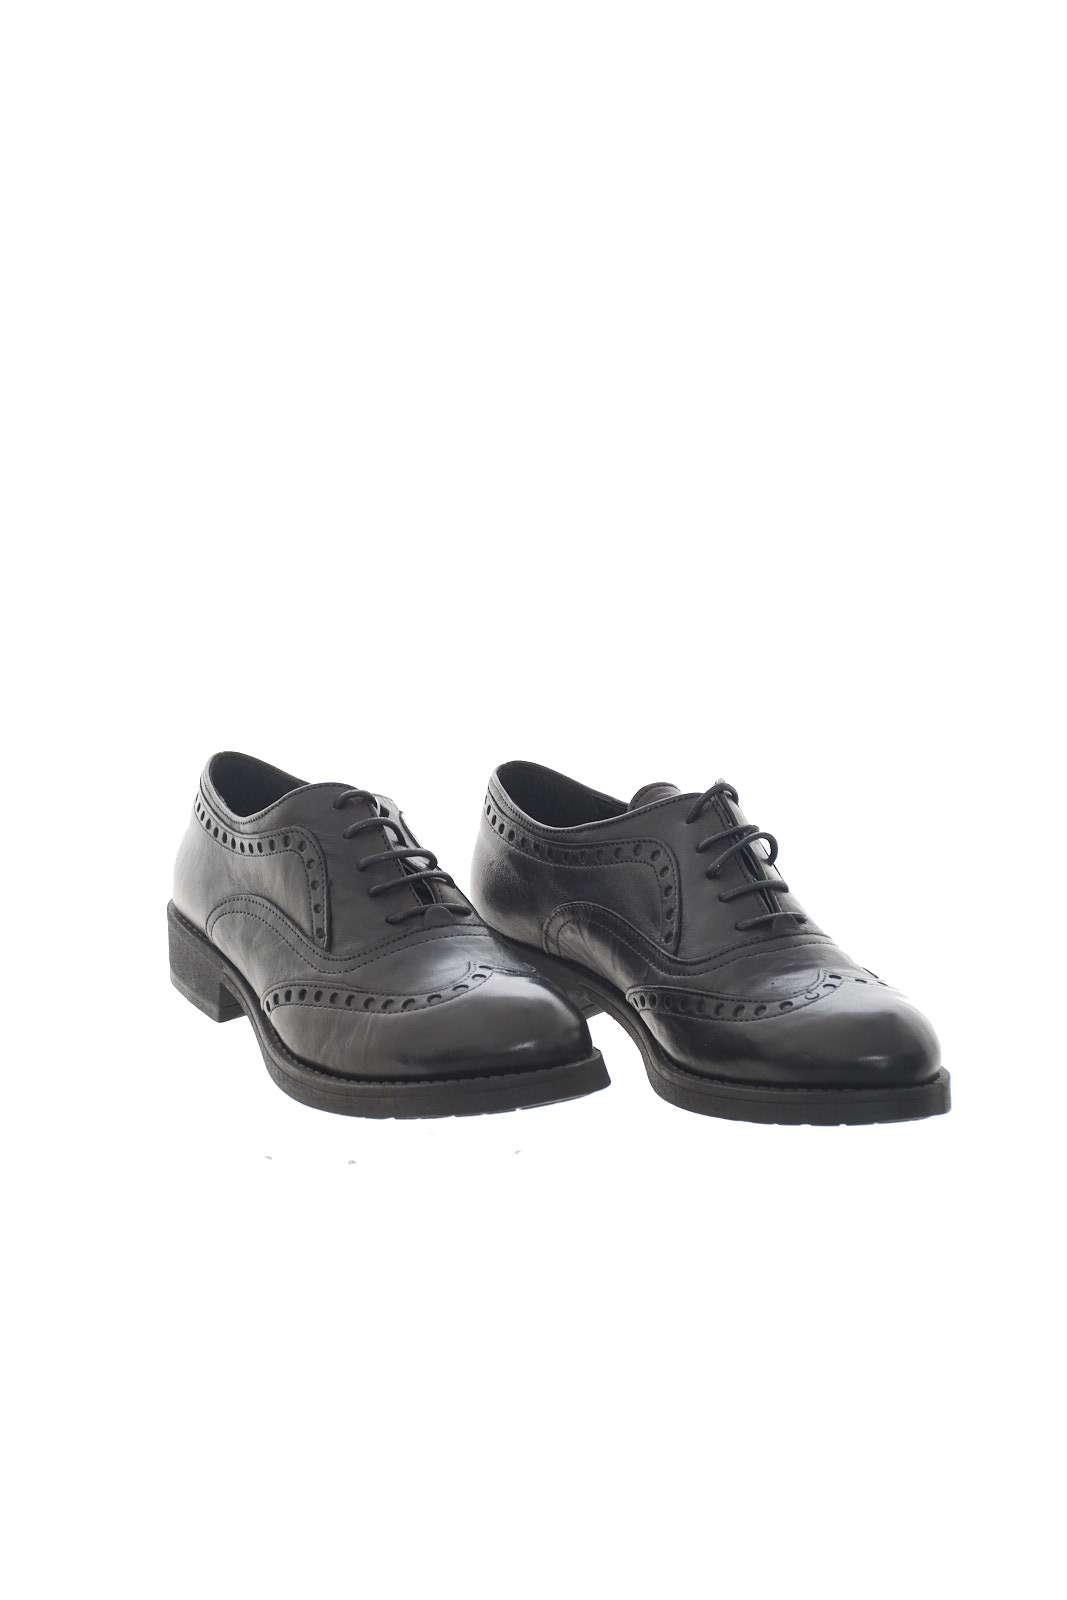 https://www.parmax.com/media/catalog/product/a/i/AI-outlet_parmax-scarpe-donna-Creative-GORI906-D.jpg